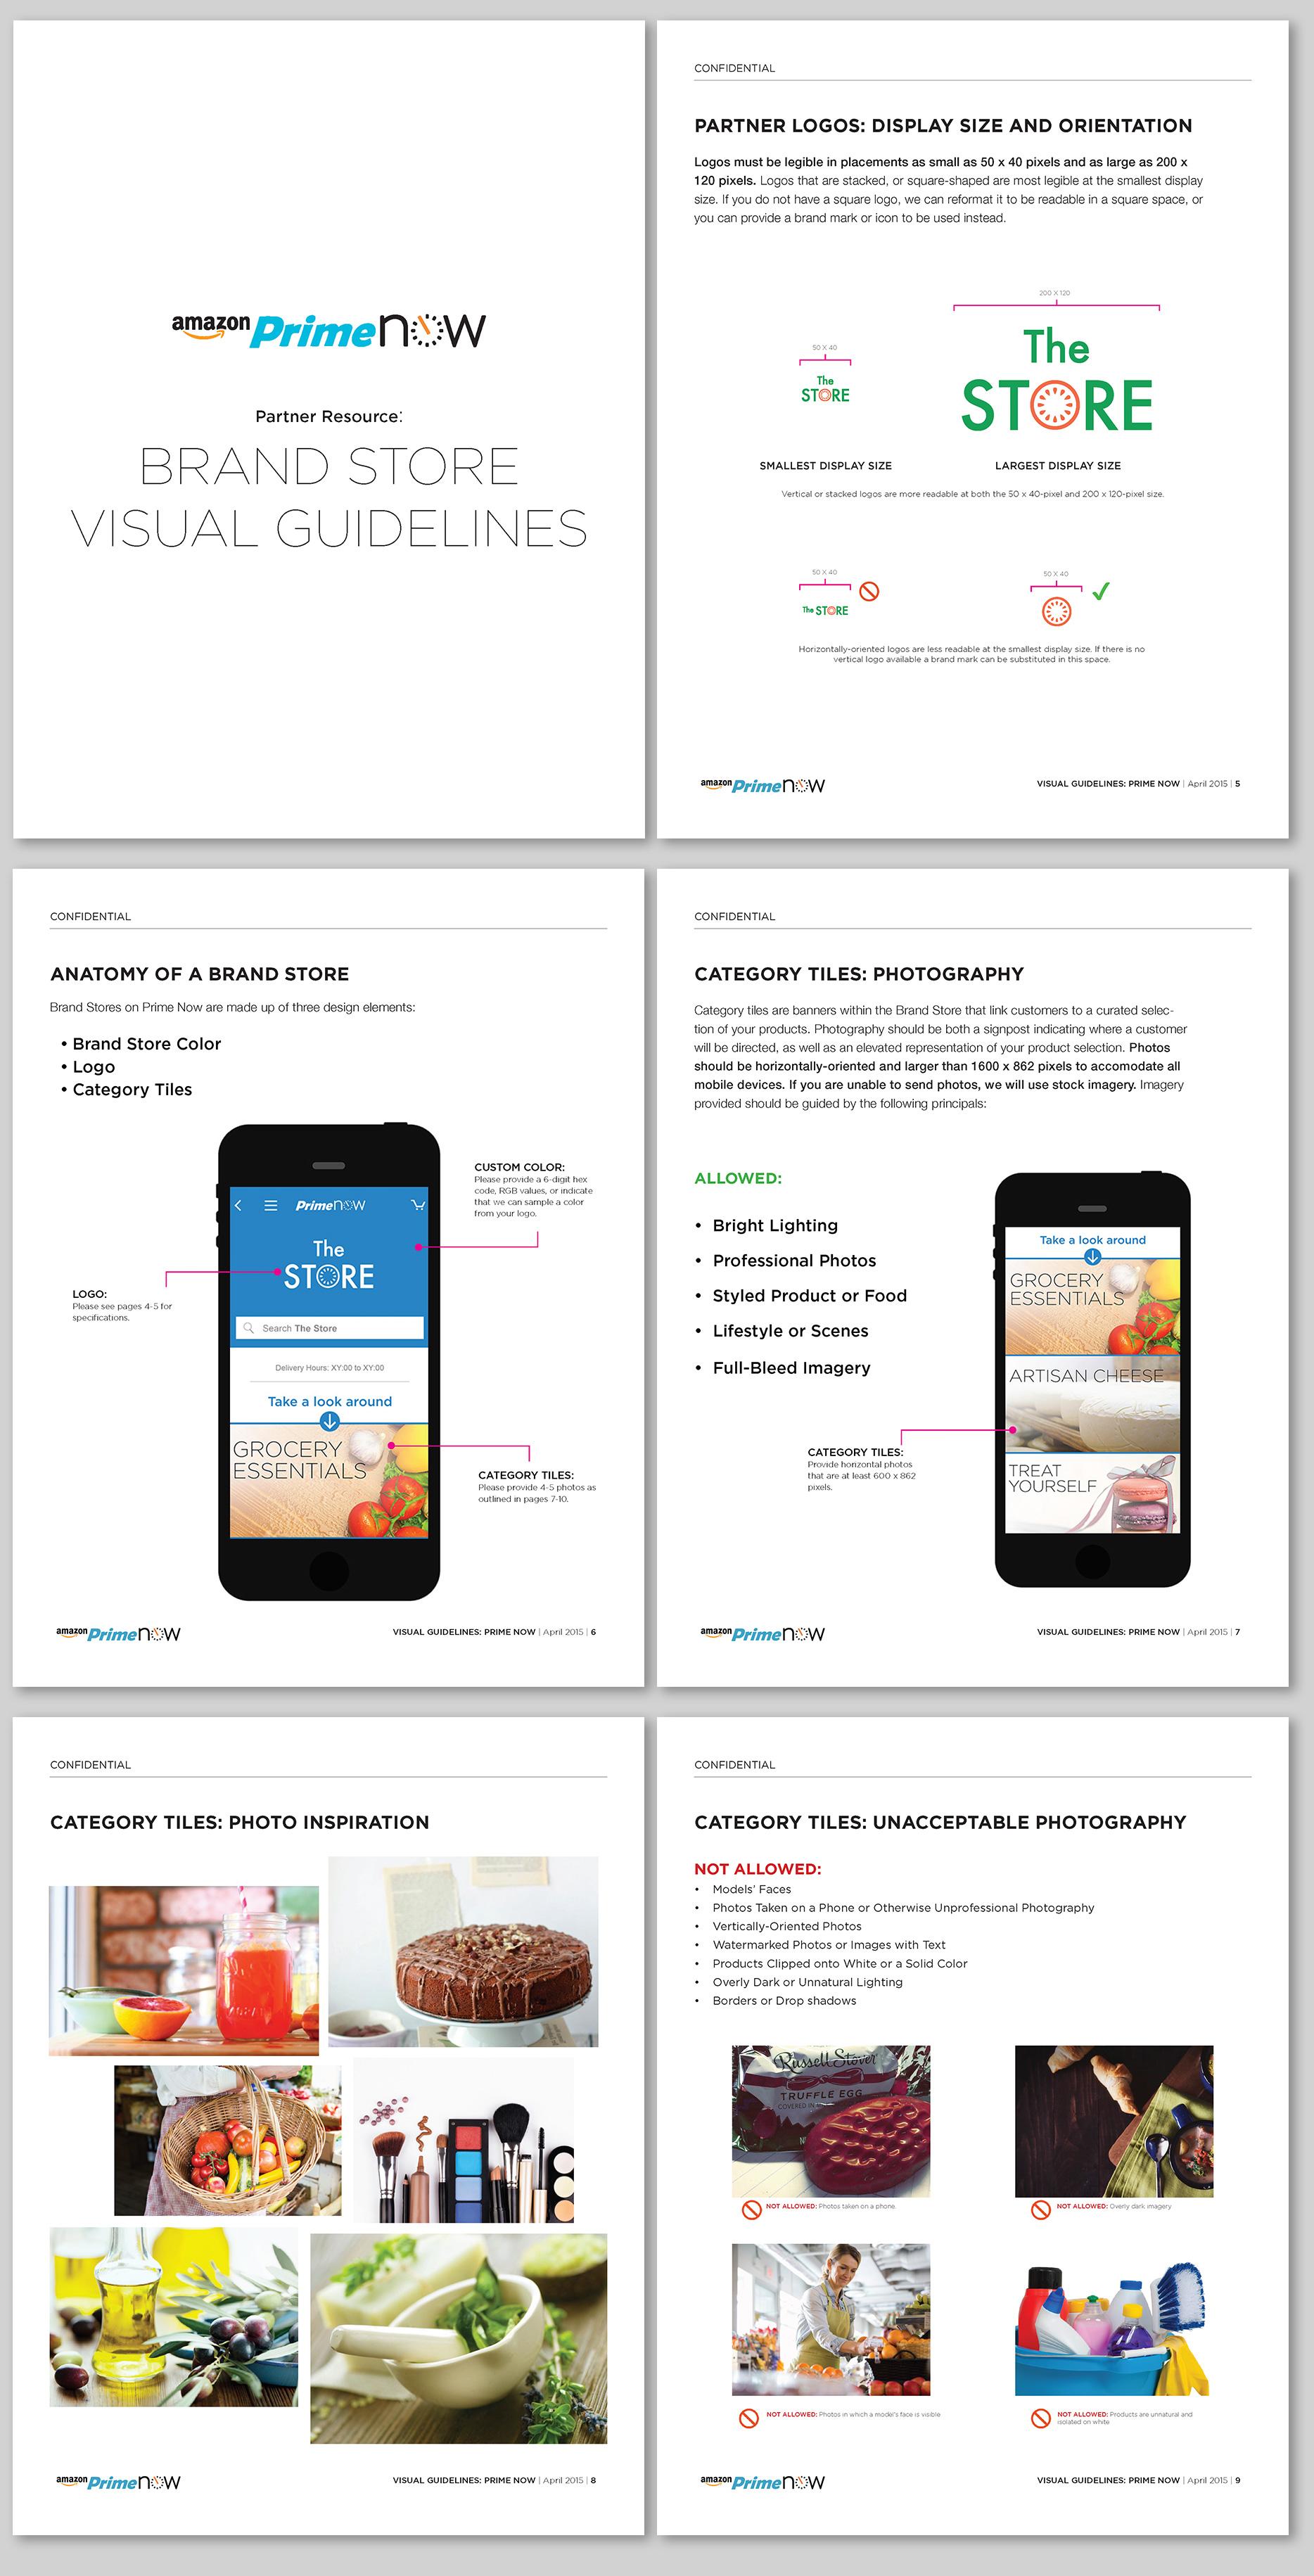 primenow_vendor_brand_book_pages